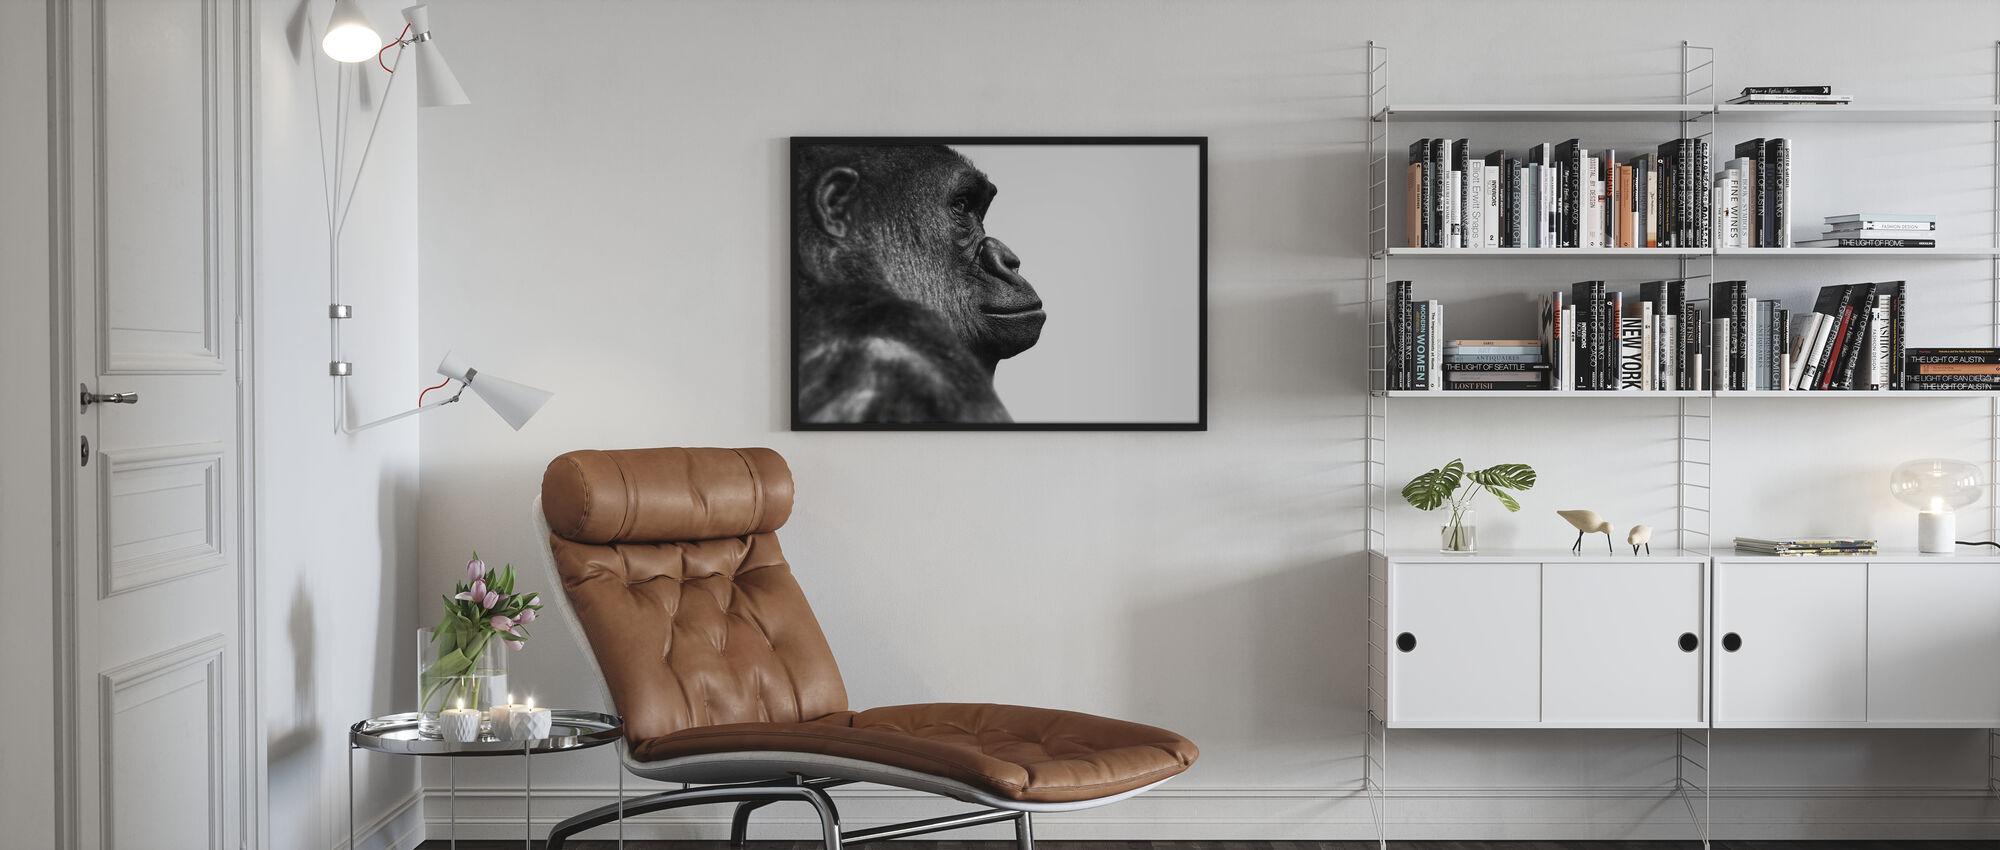 Gorilla - b/w - Poster - Living Room